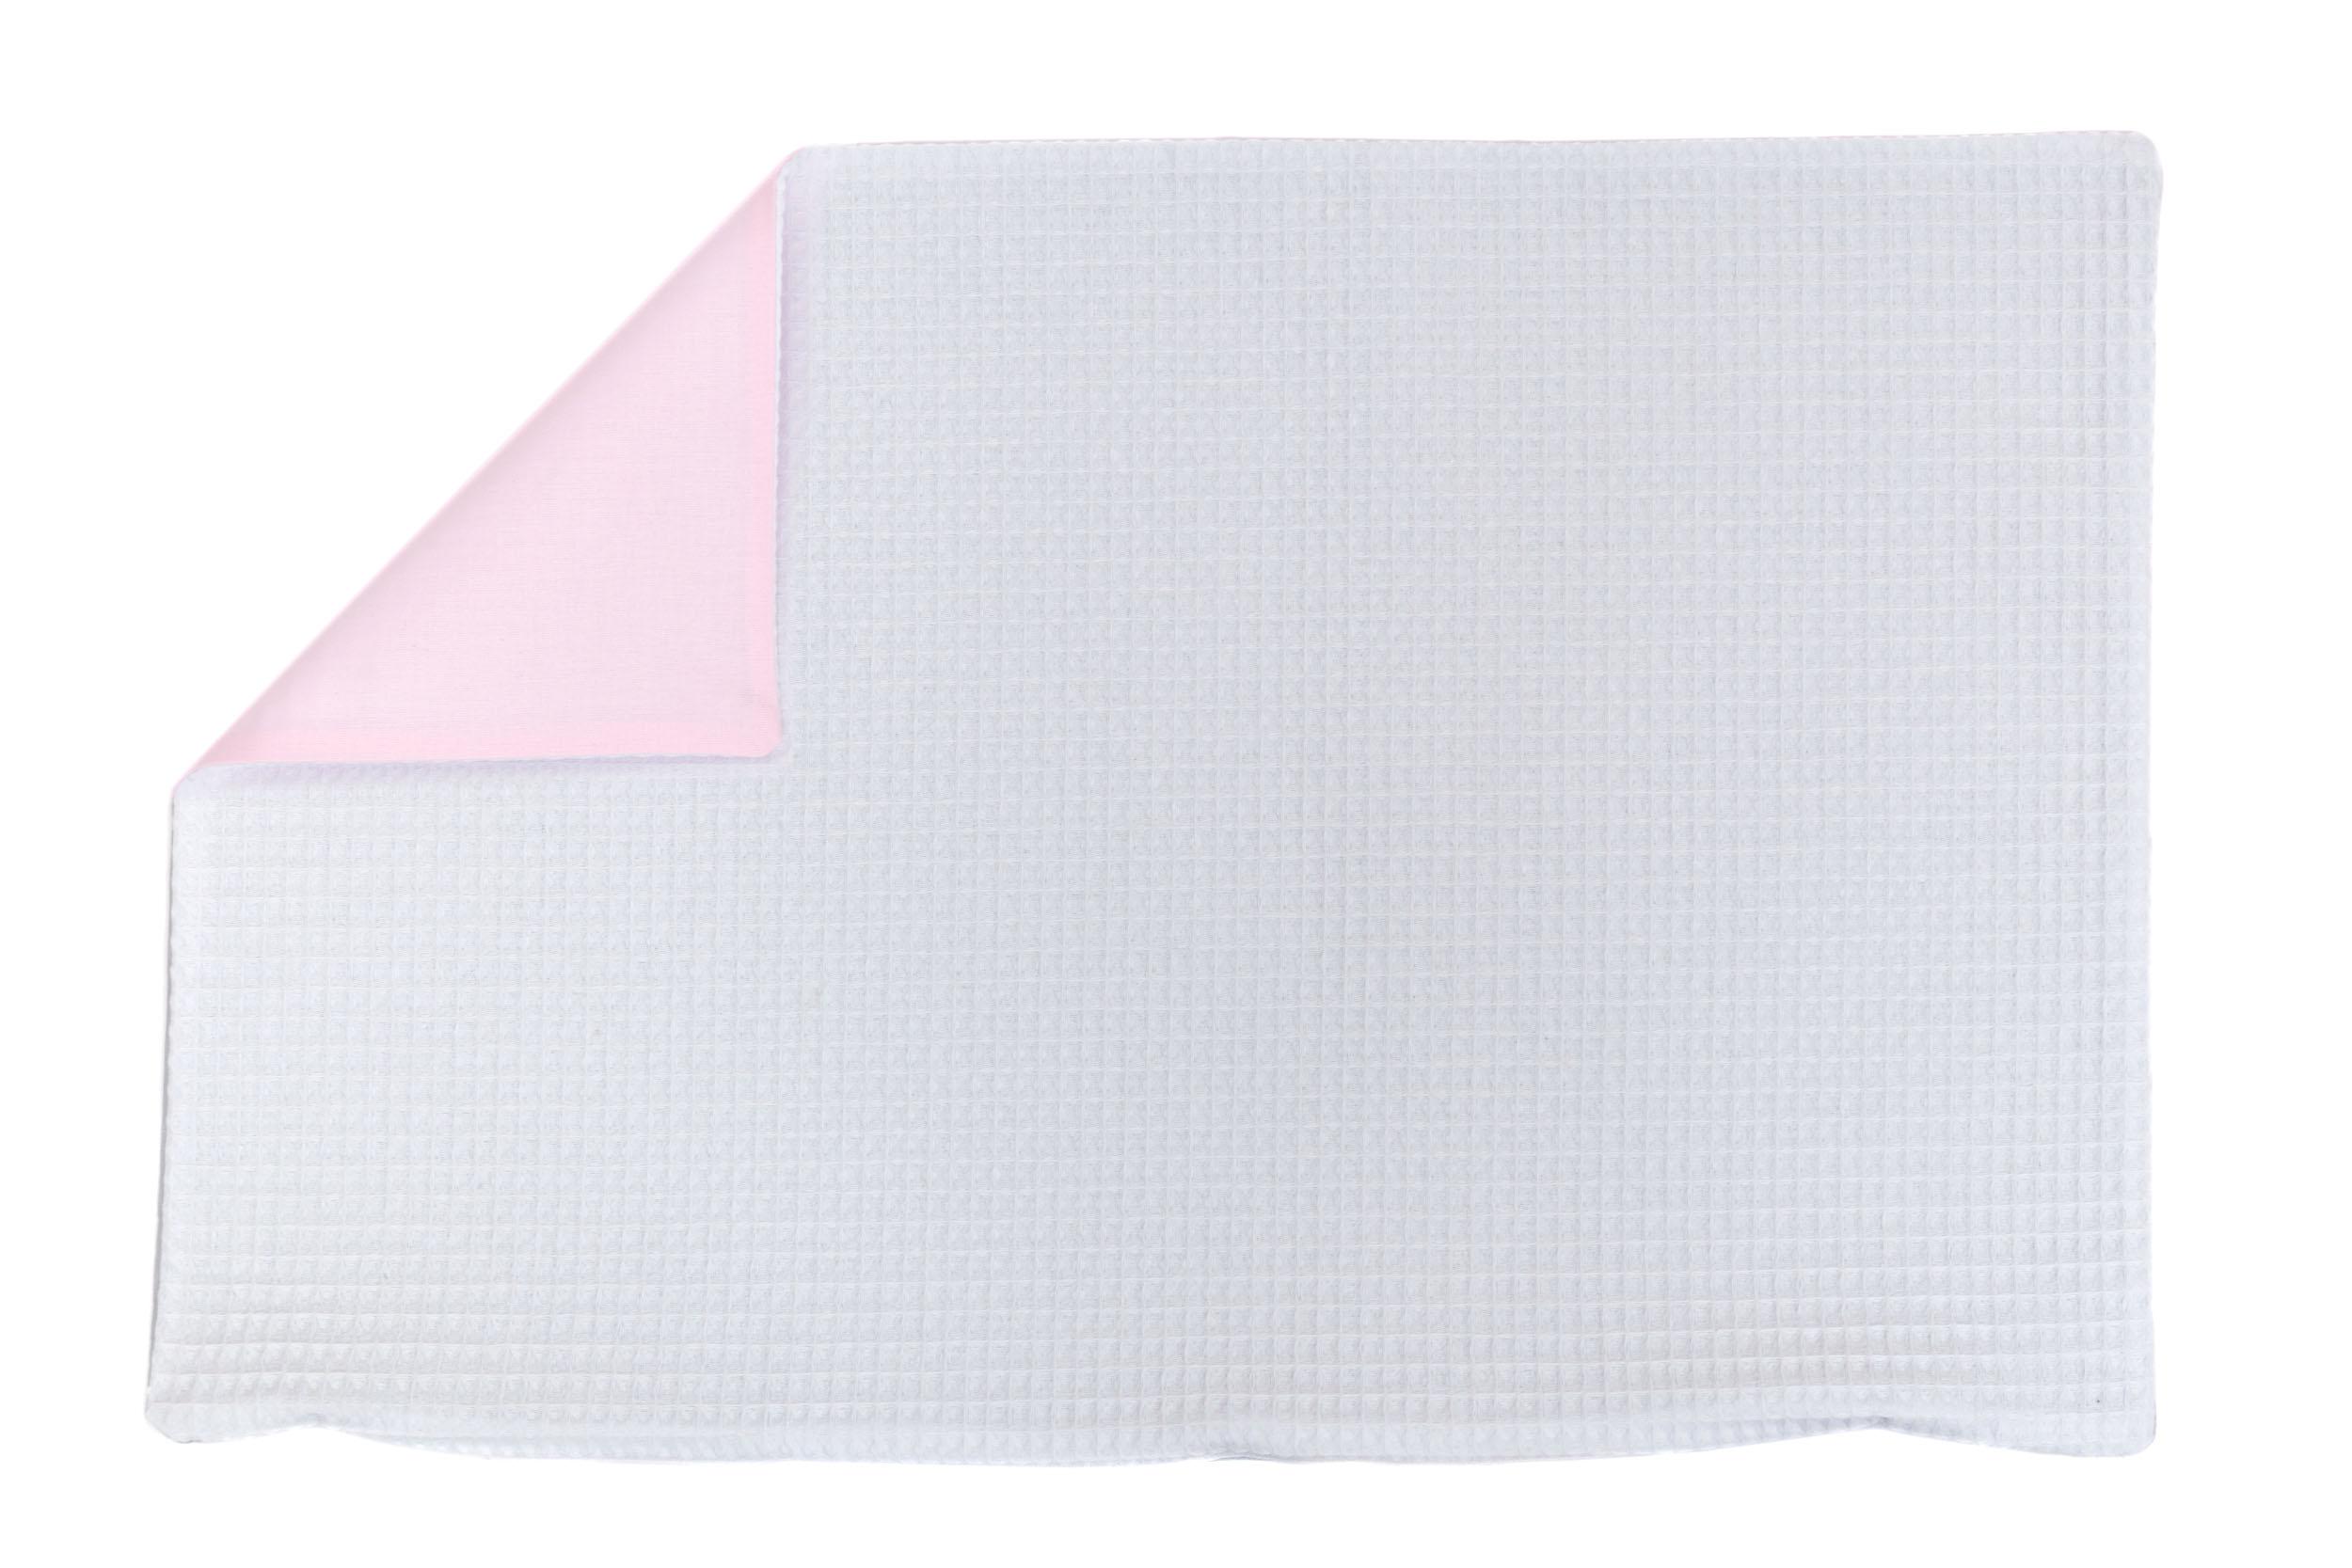 Kissenhülle Zierkissenbezug Kissenbezug ca. 60x40 cm für Kissen oder Dekokissen Weiß Hellrosa